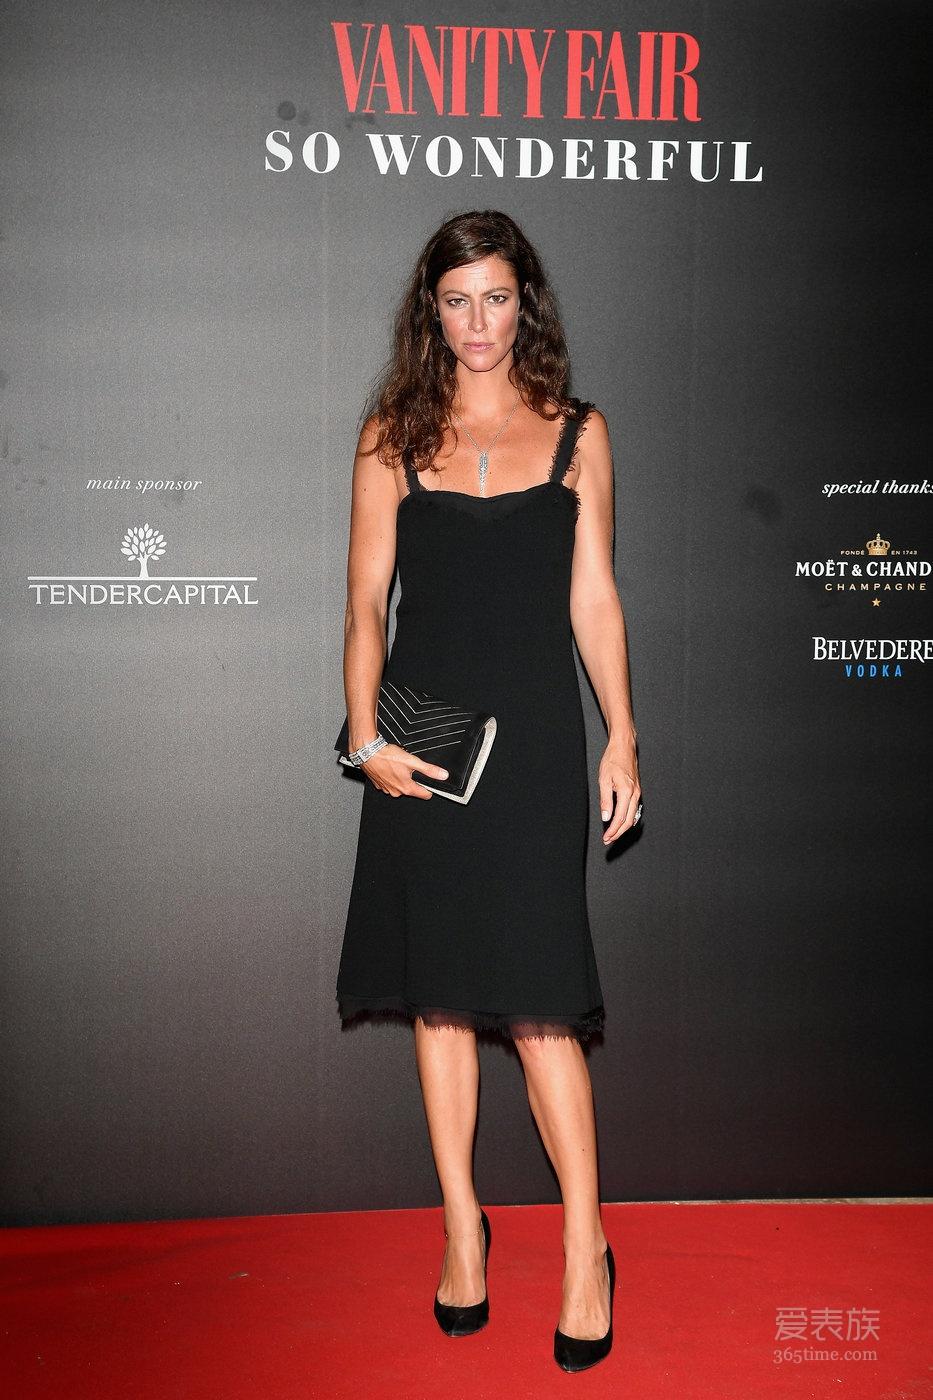 第74届威尼斯电影节(74th Venice Film Festival)《名利场》(Vanity Fair)派对